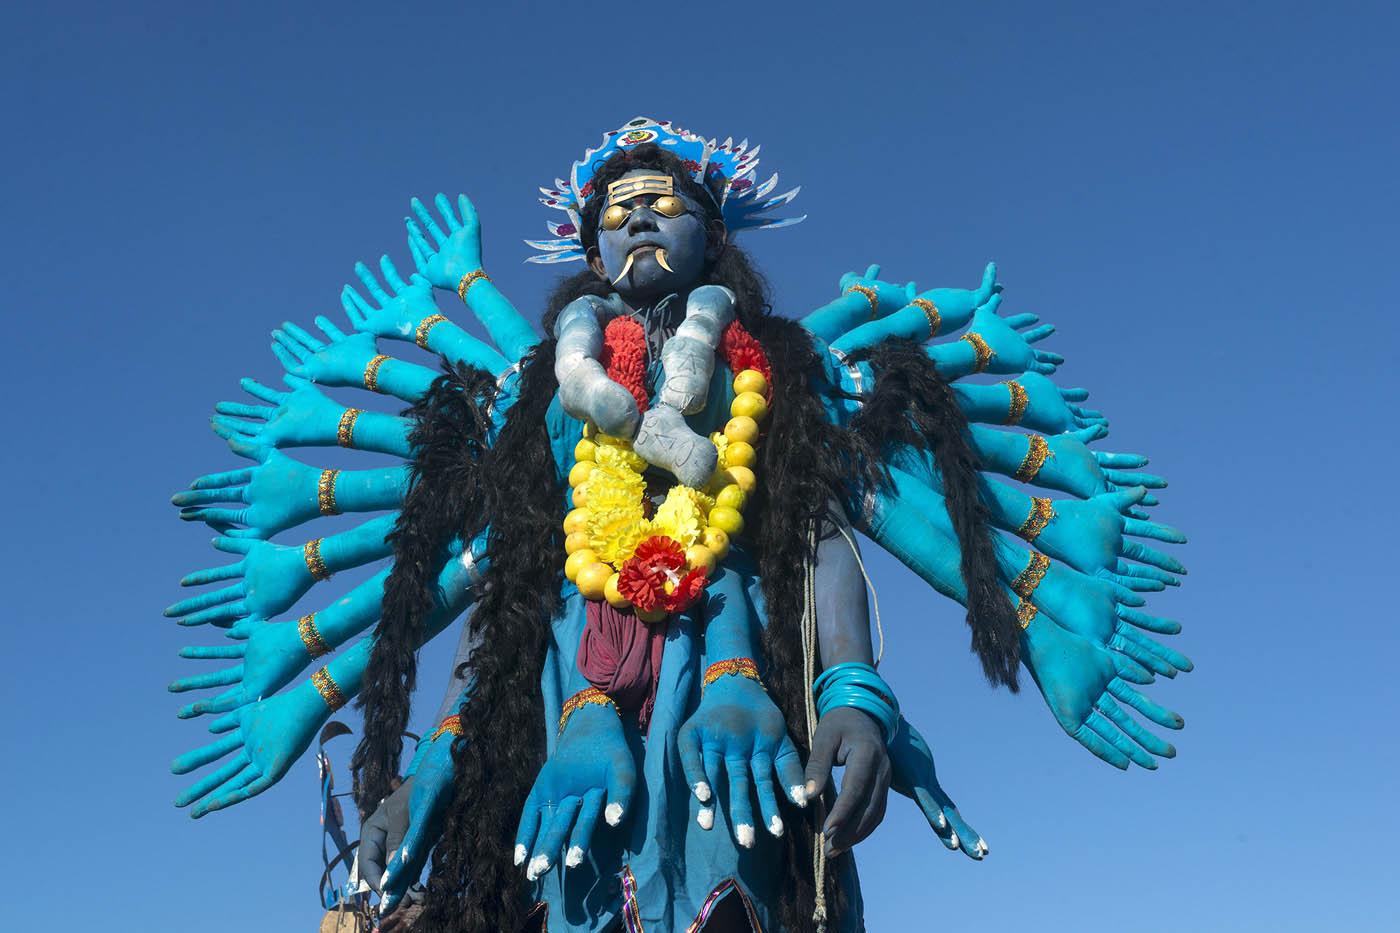 travel photography indian kulasai dhasara festival by saravanan dhandapani